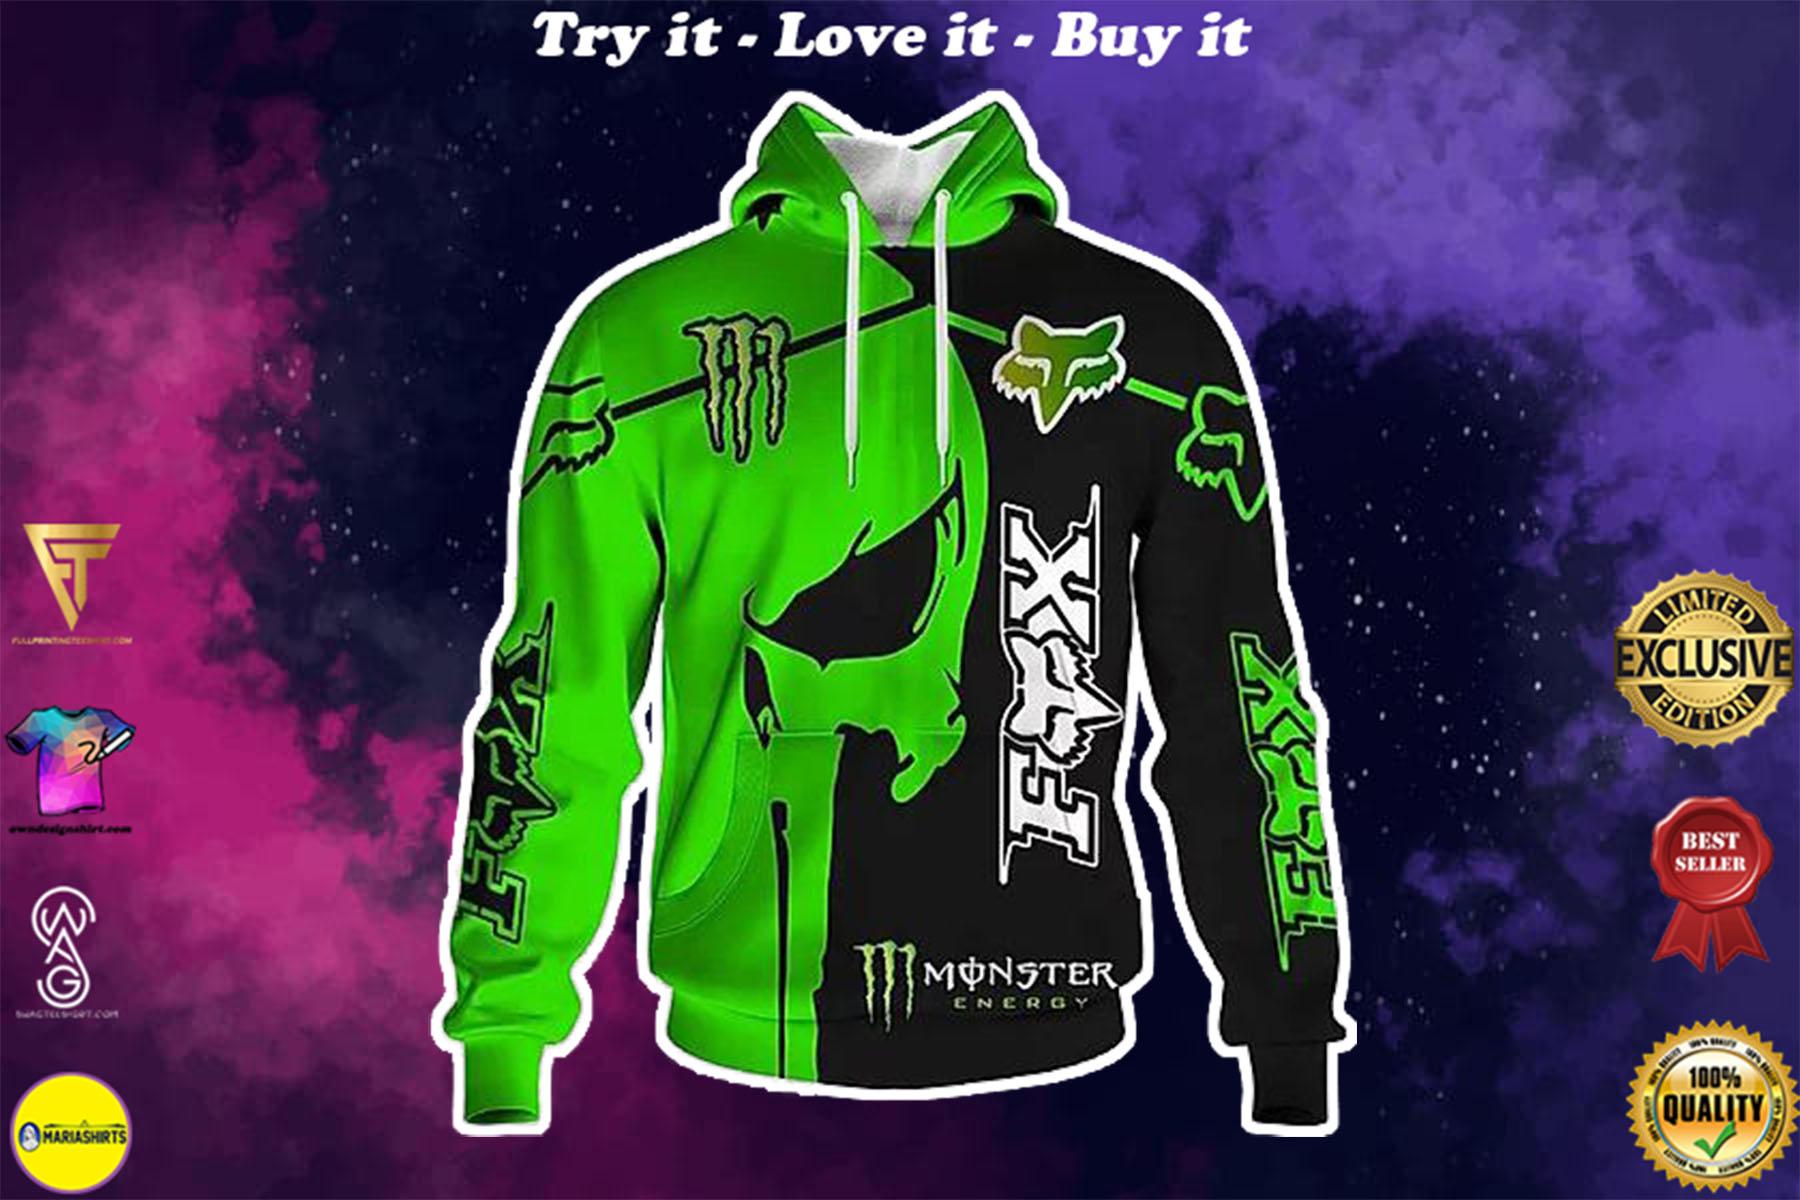 [special edition] monster energy skull full printing shirt - maria